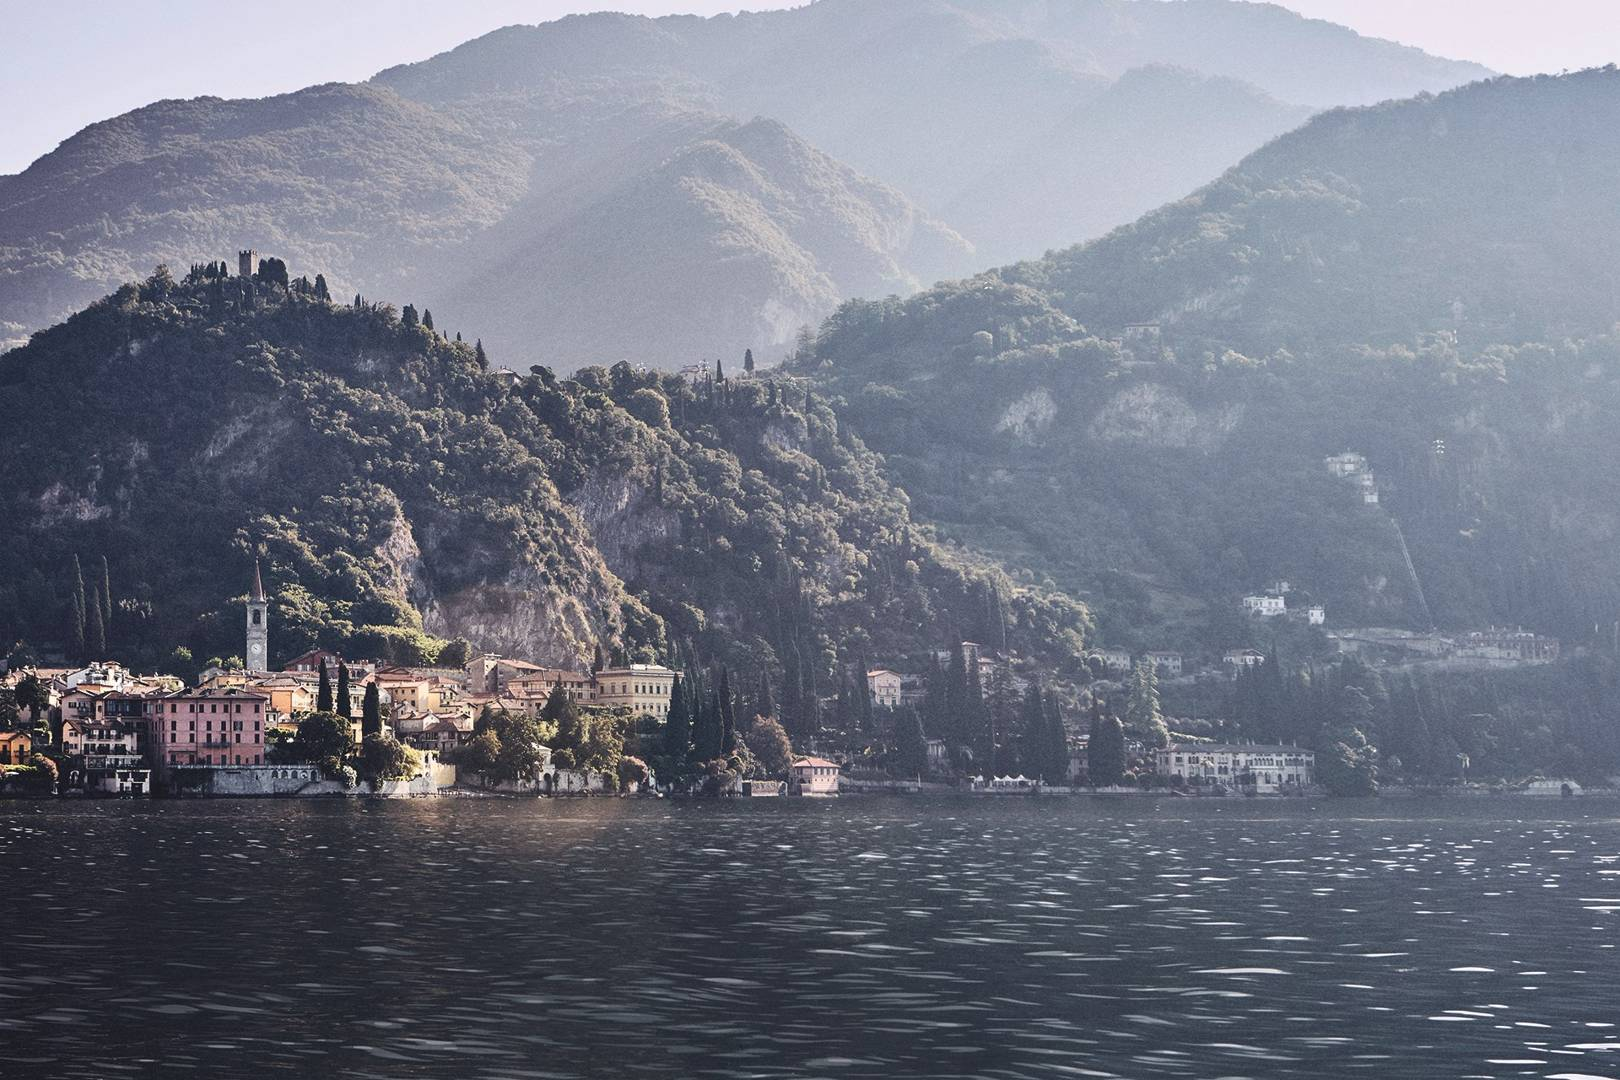 Lake Como: Italy's greatest lake